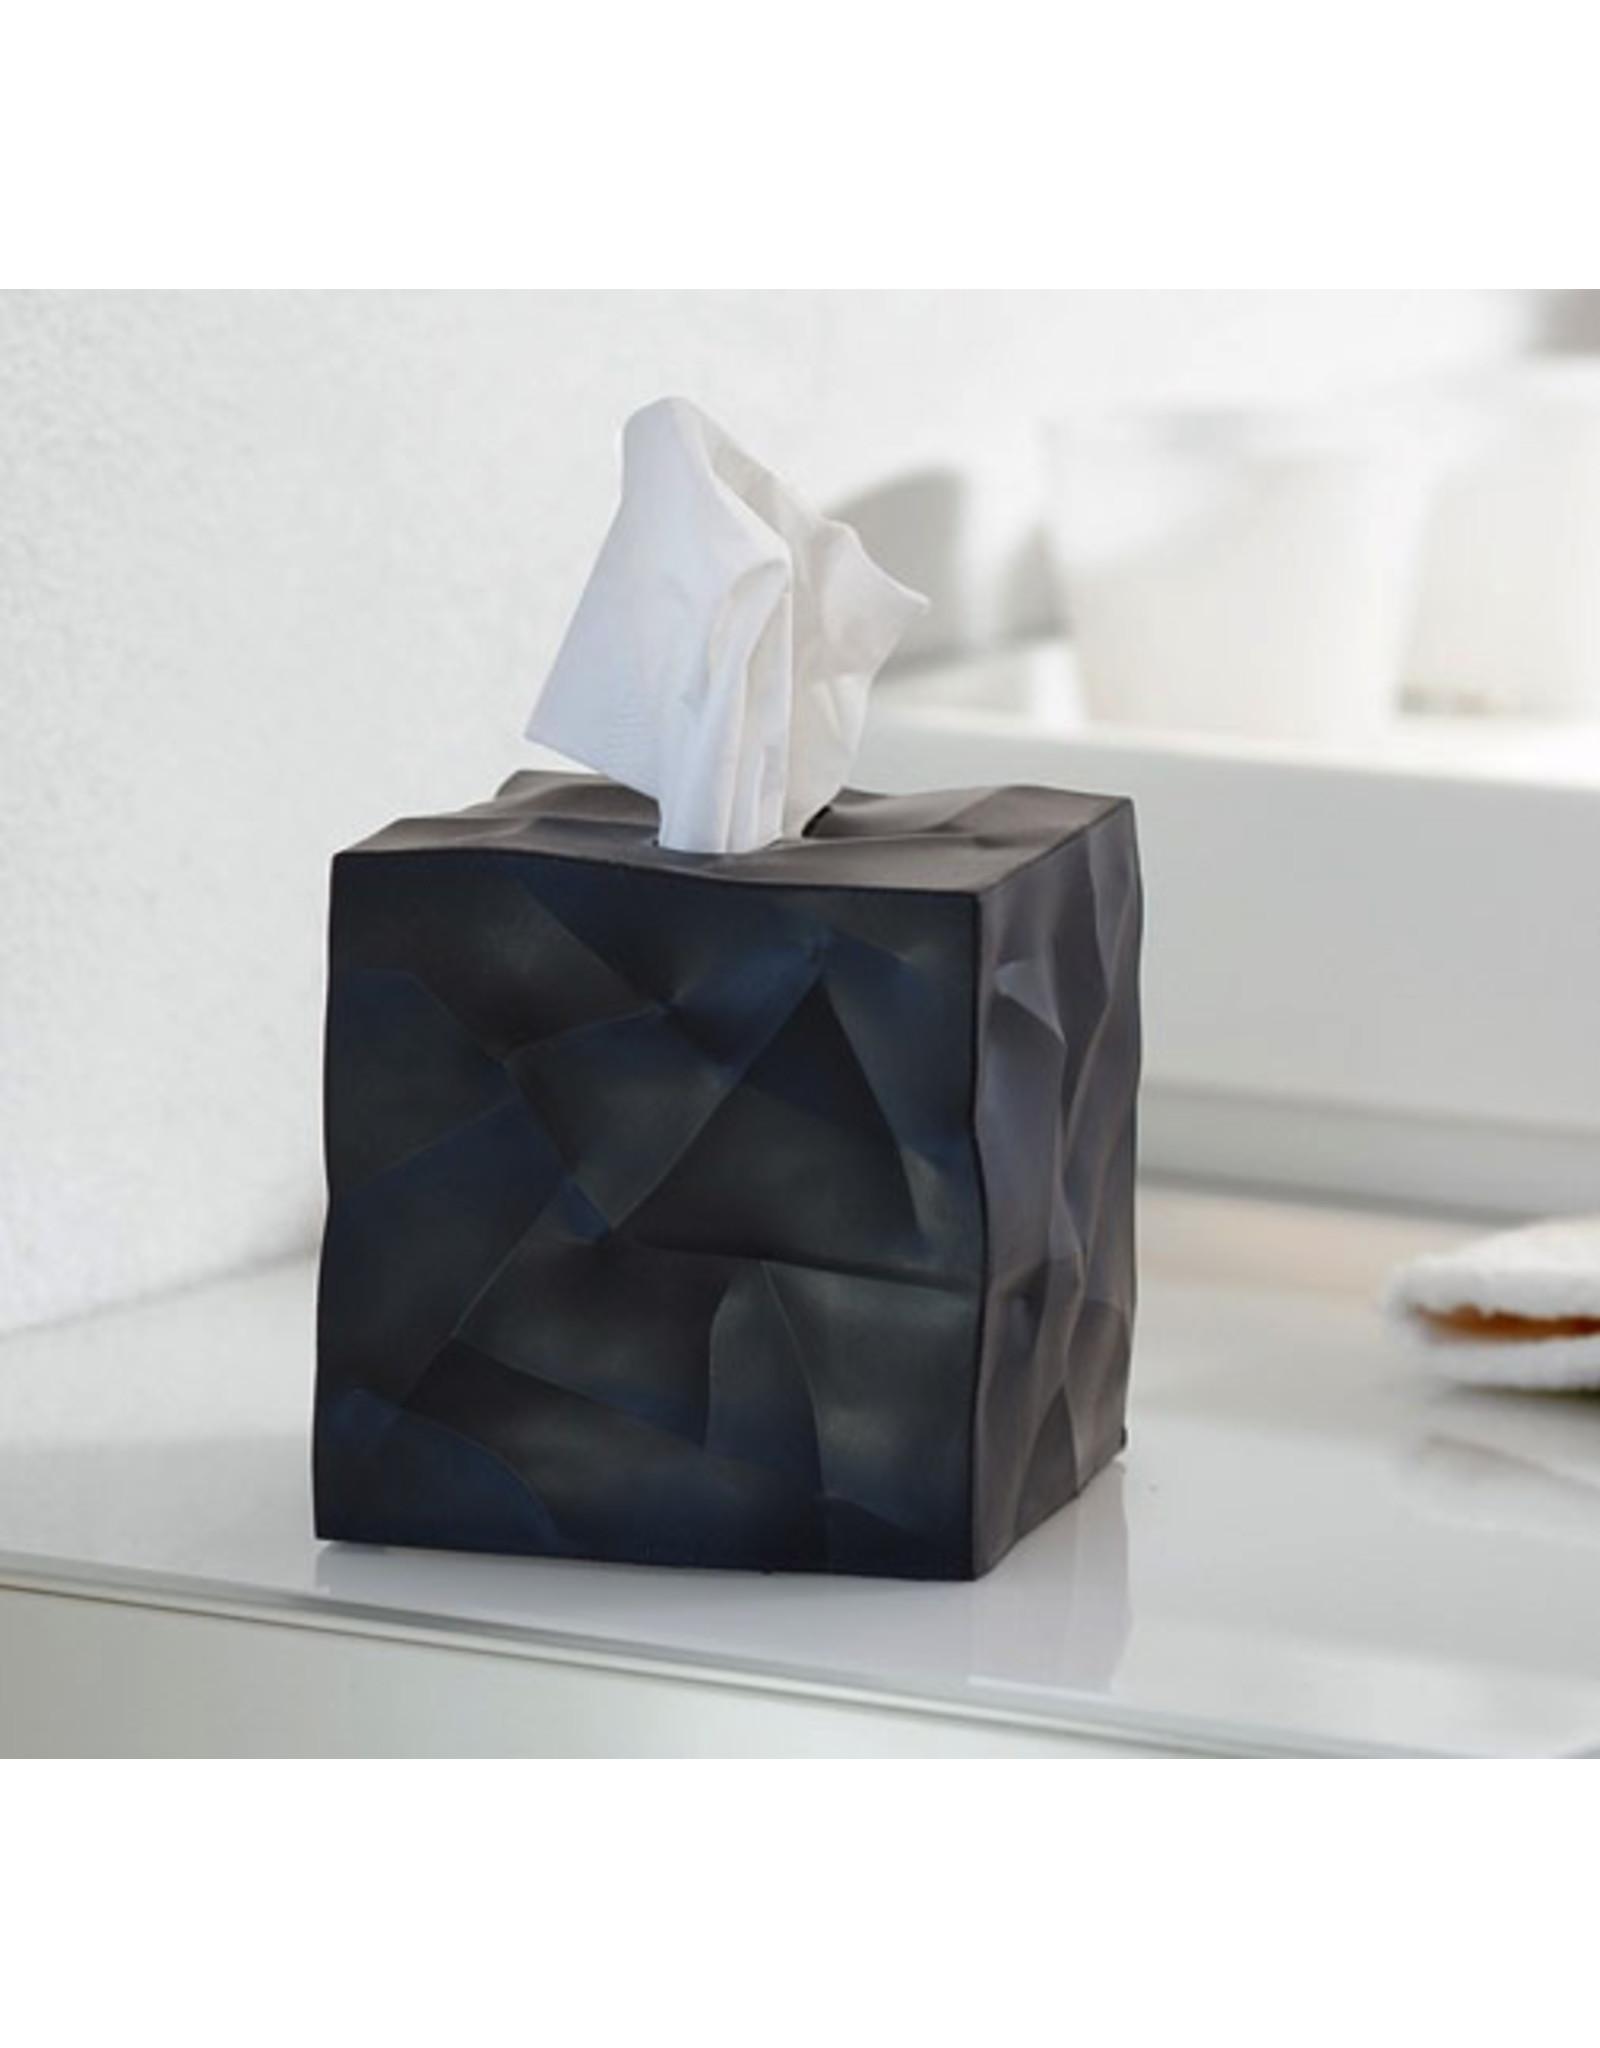 accessoires WIPY I TISUE BOX BLACK